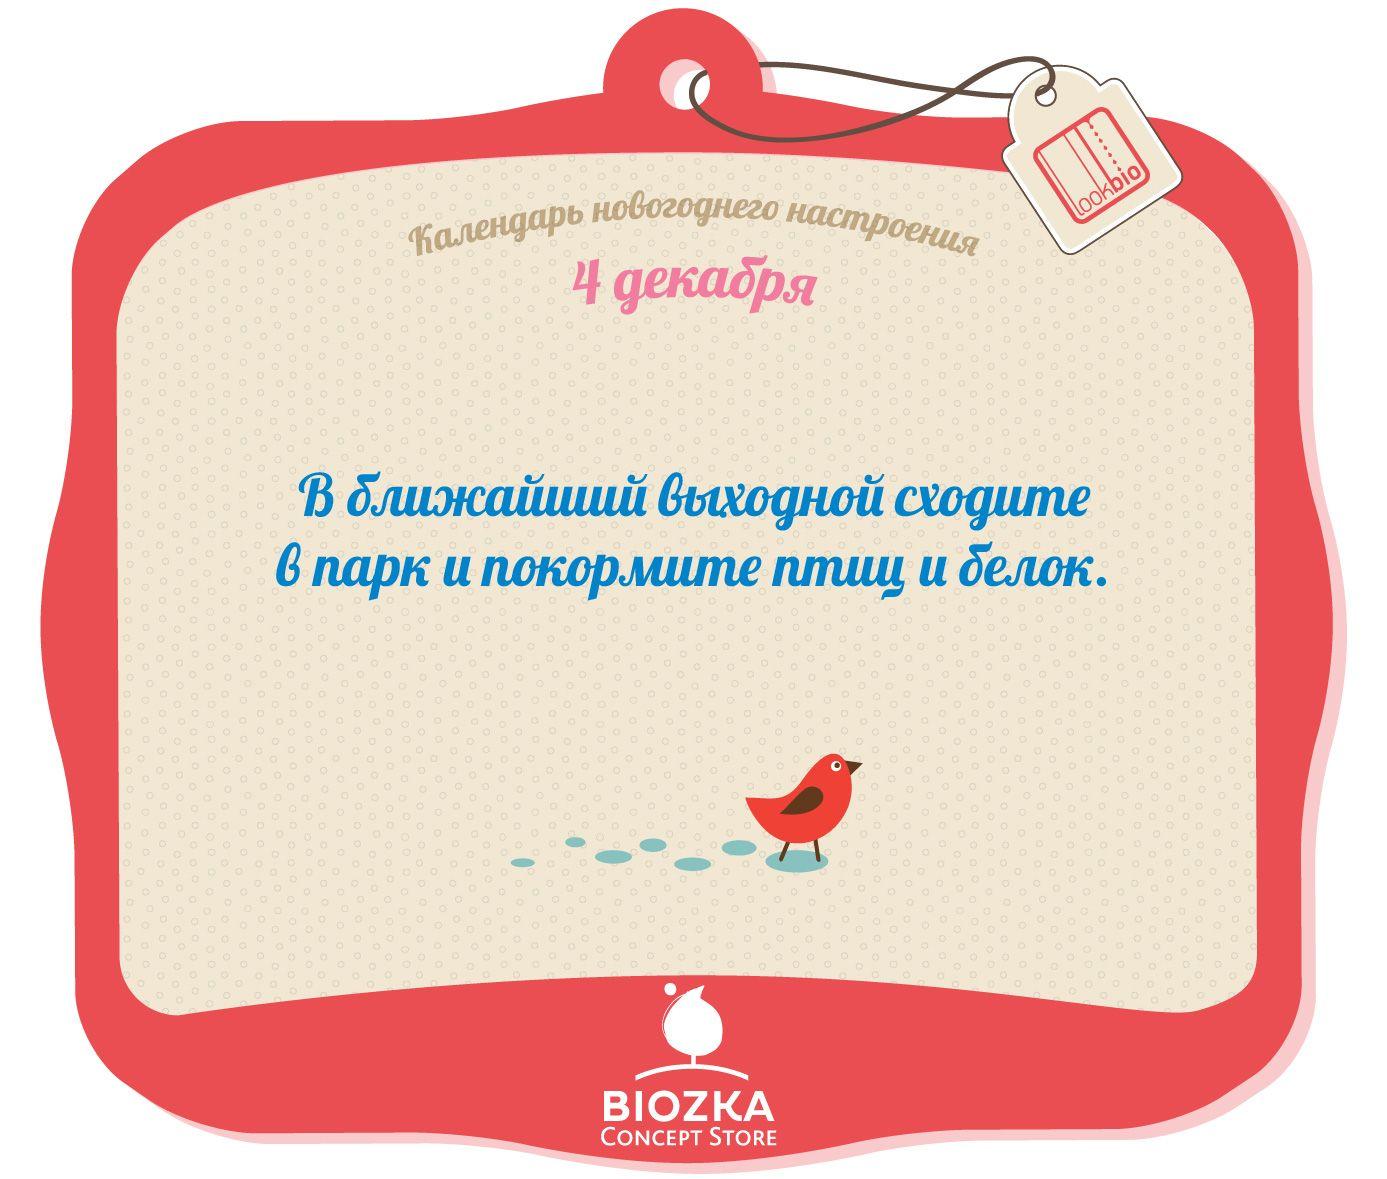 lookbio_advent_4